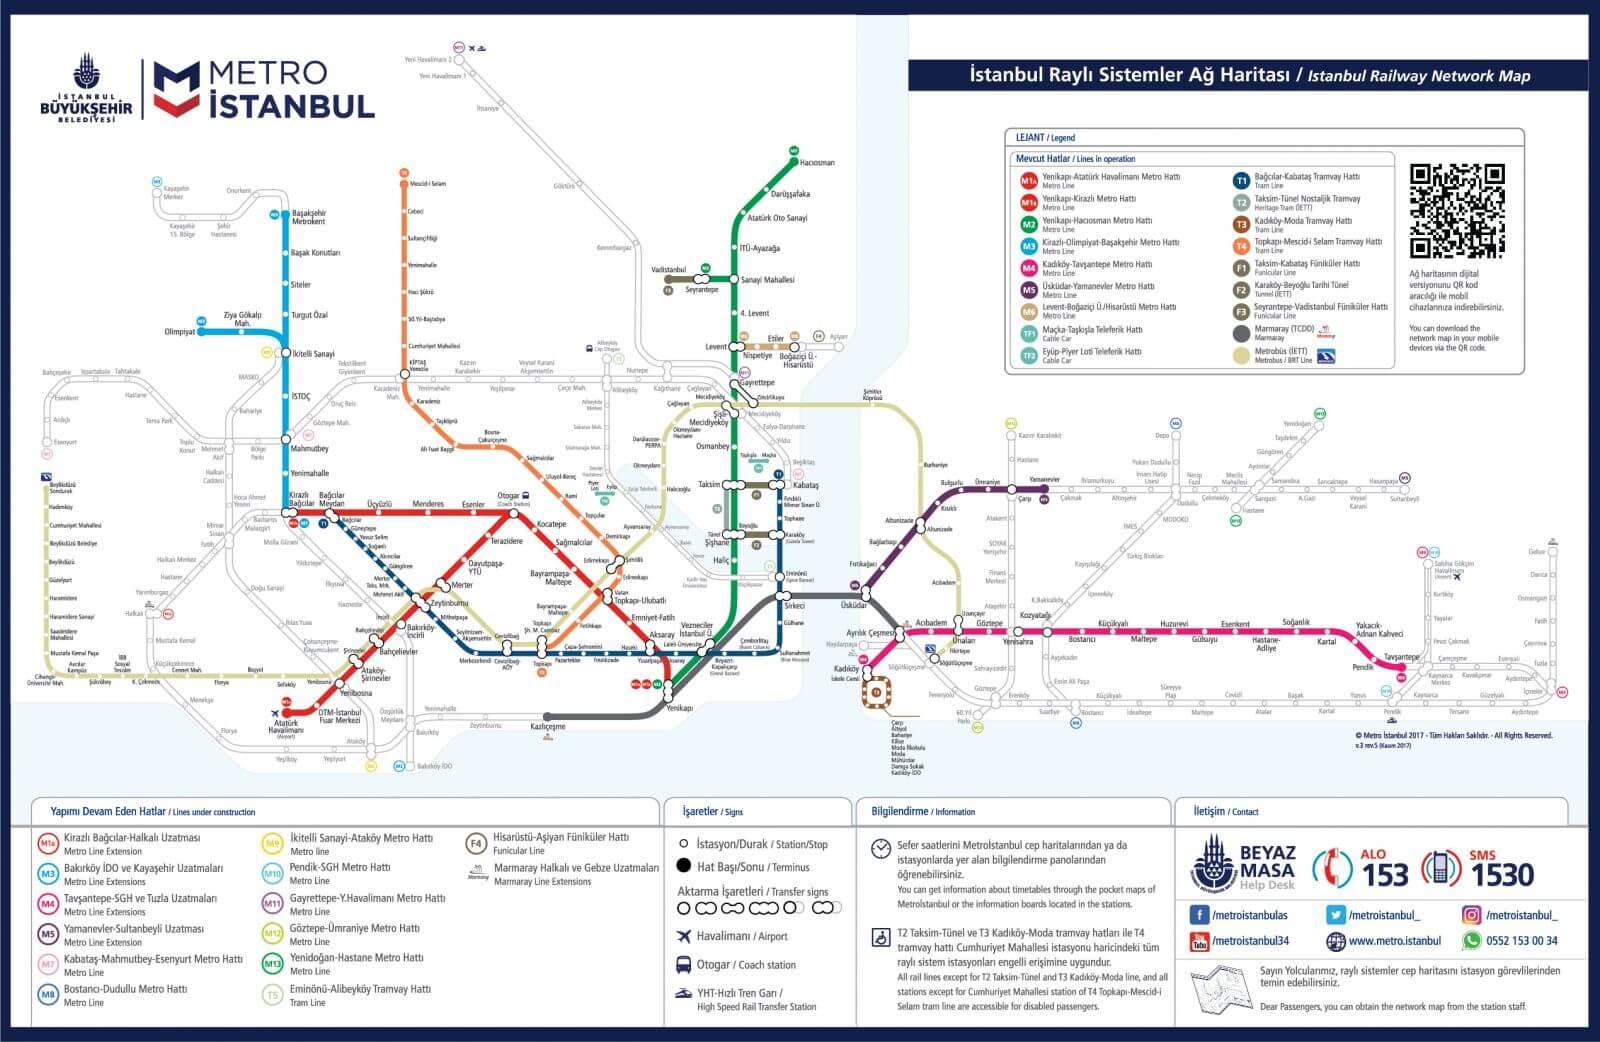 İstanbul Ulaşım Ağ Haritası